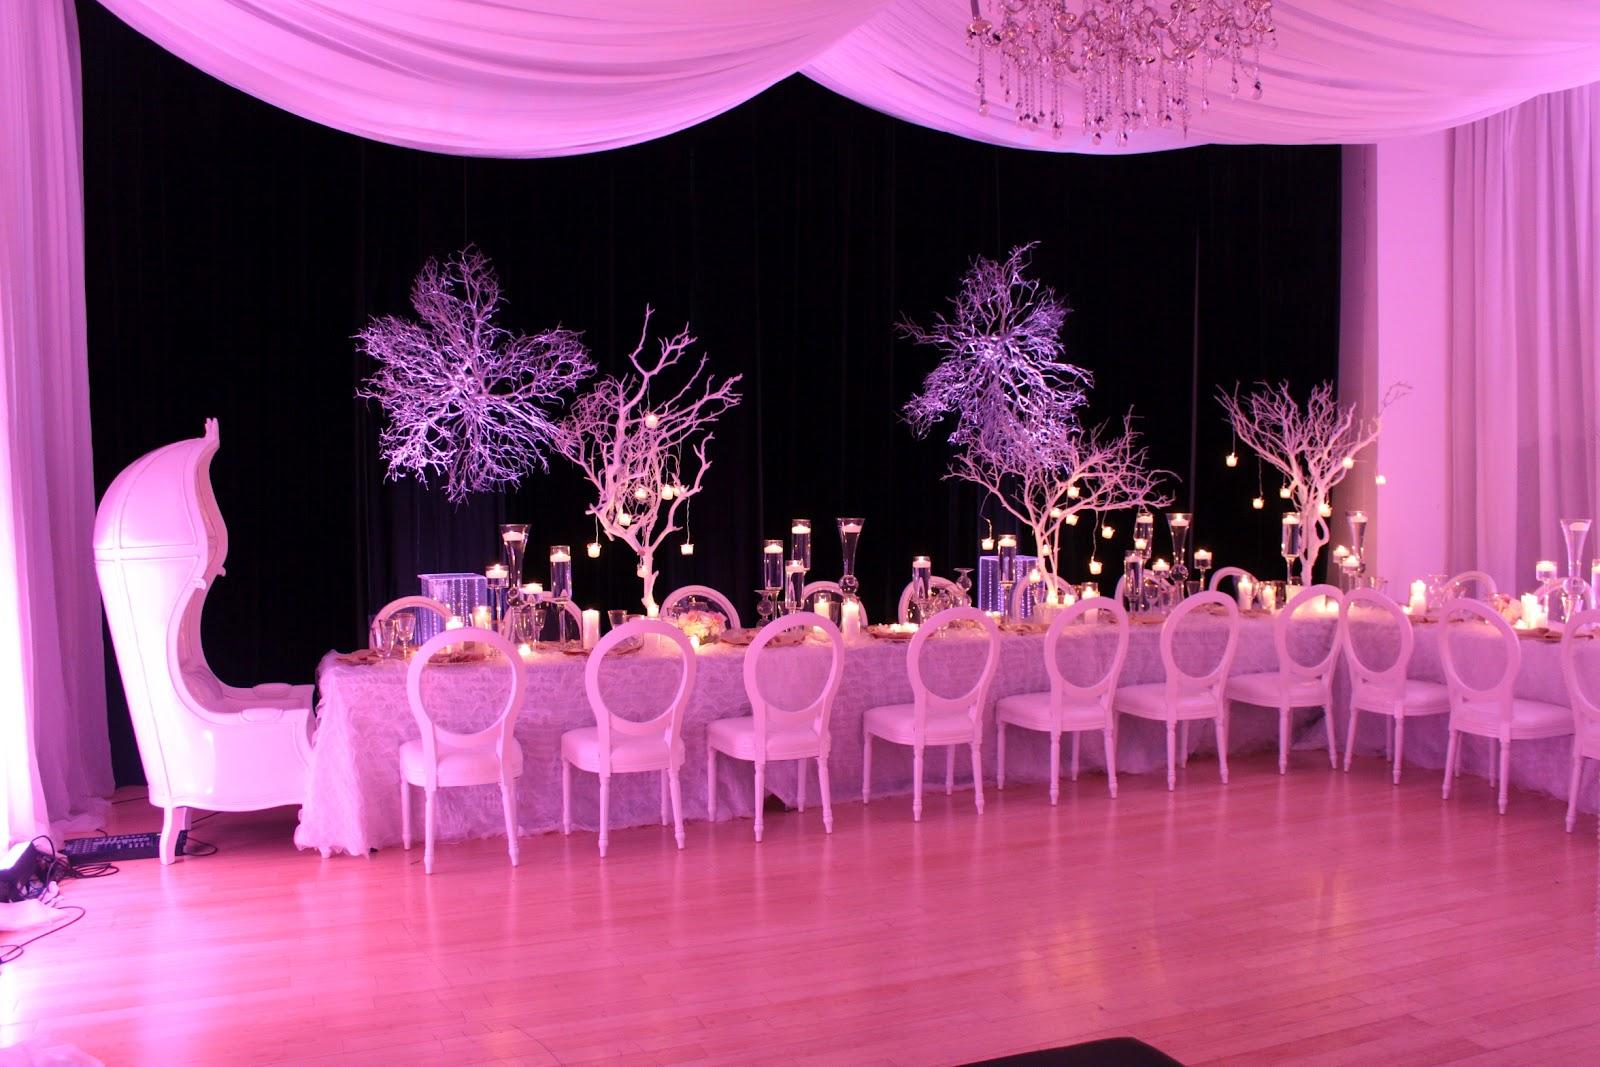 Decor flowers and lighting by us. | Davinci Florist